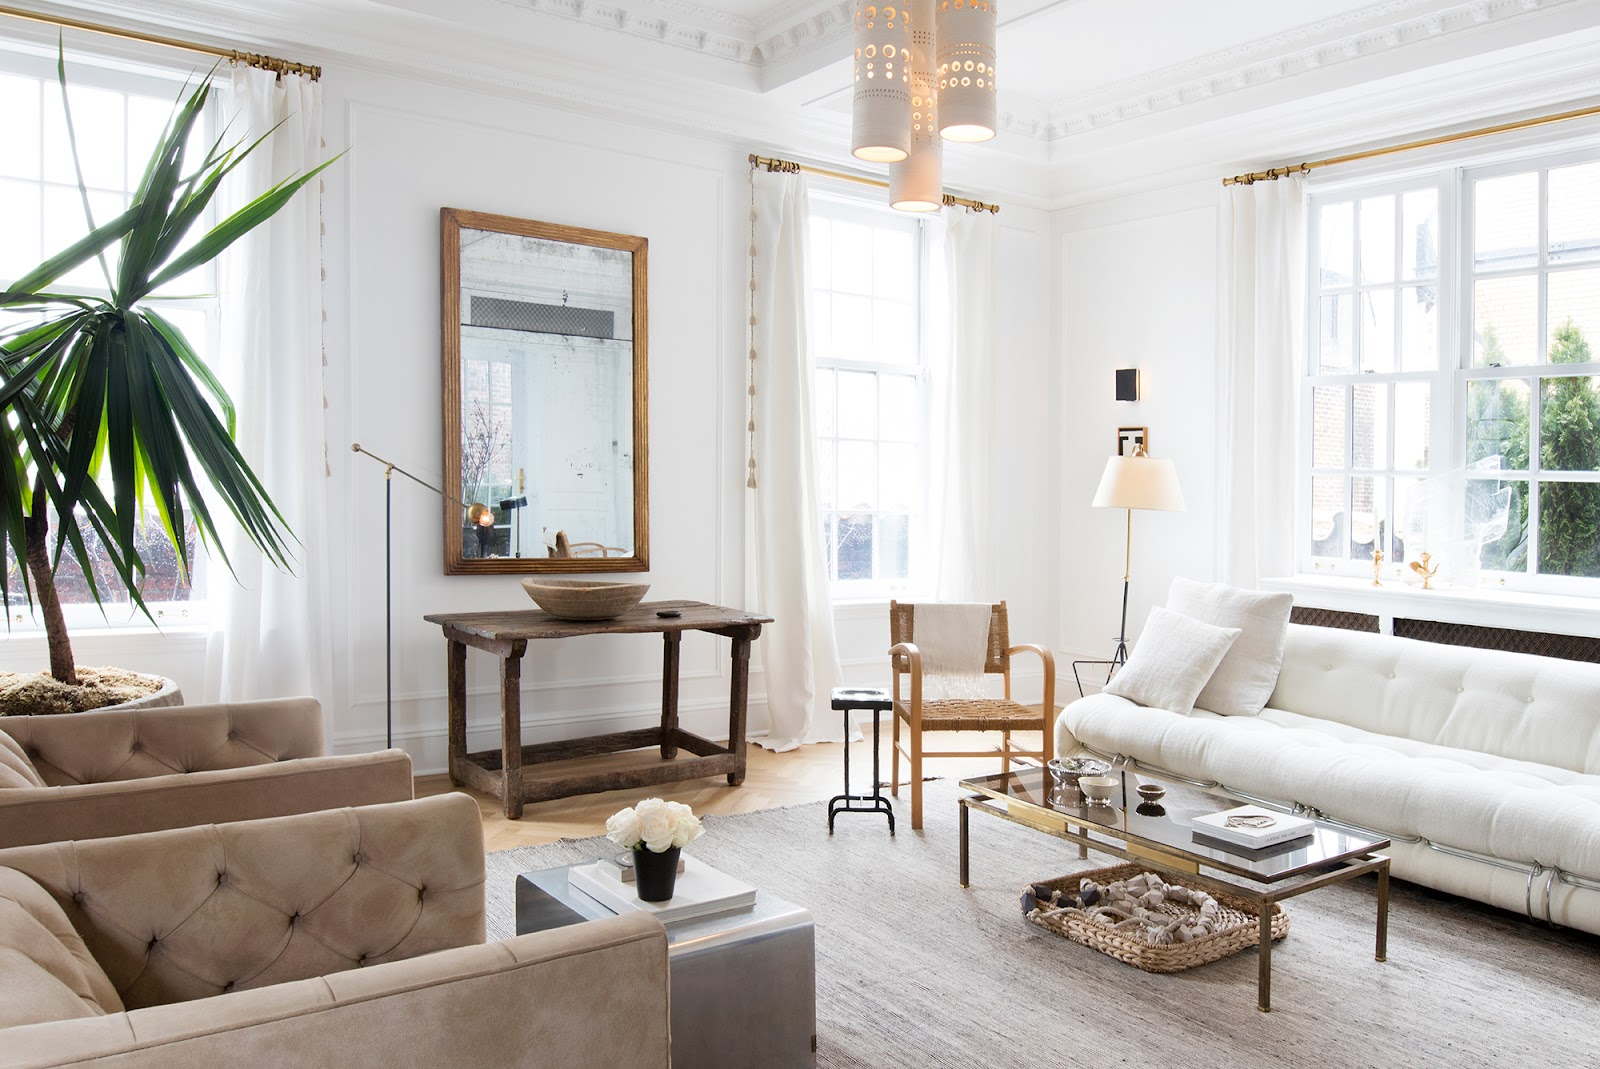 Inspirasi desain interior modern karya Jeremiah Brent - source: eye-swoon.com